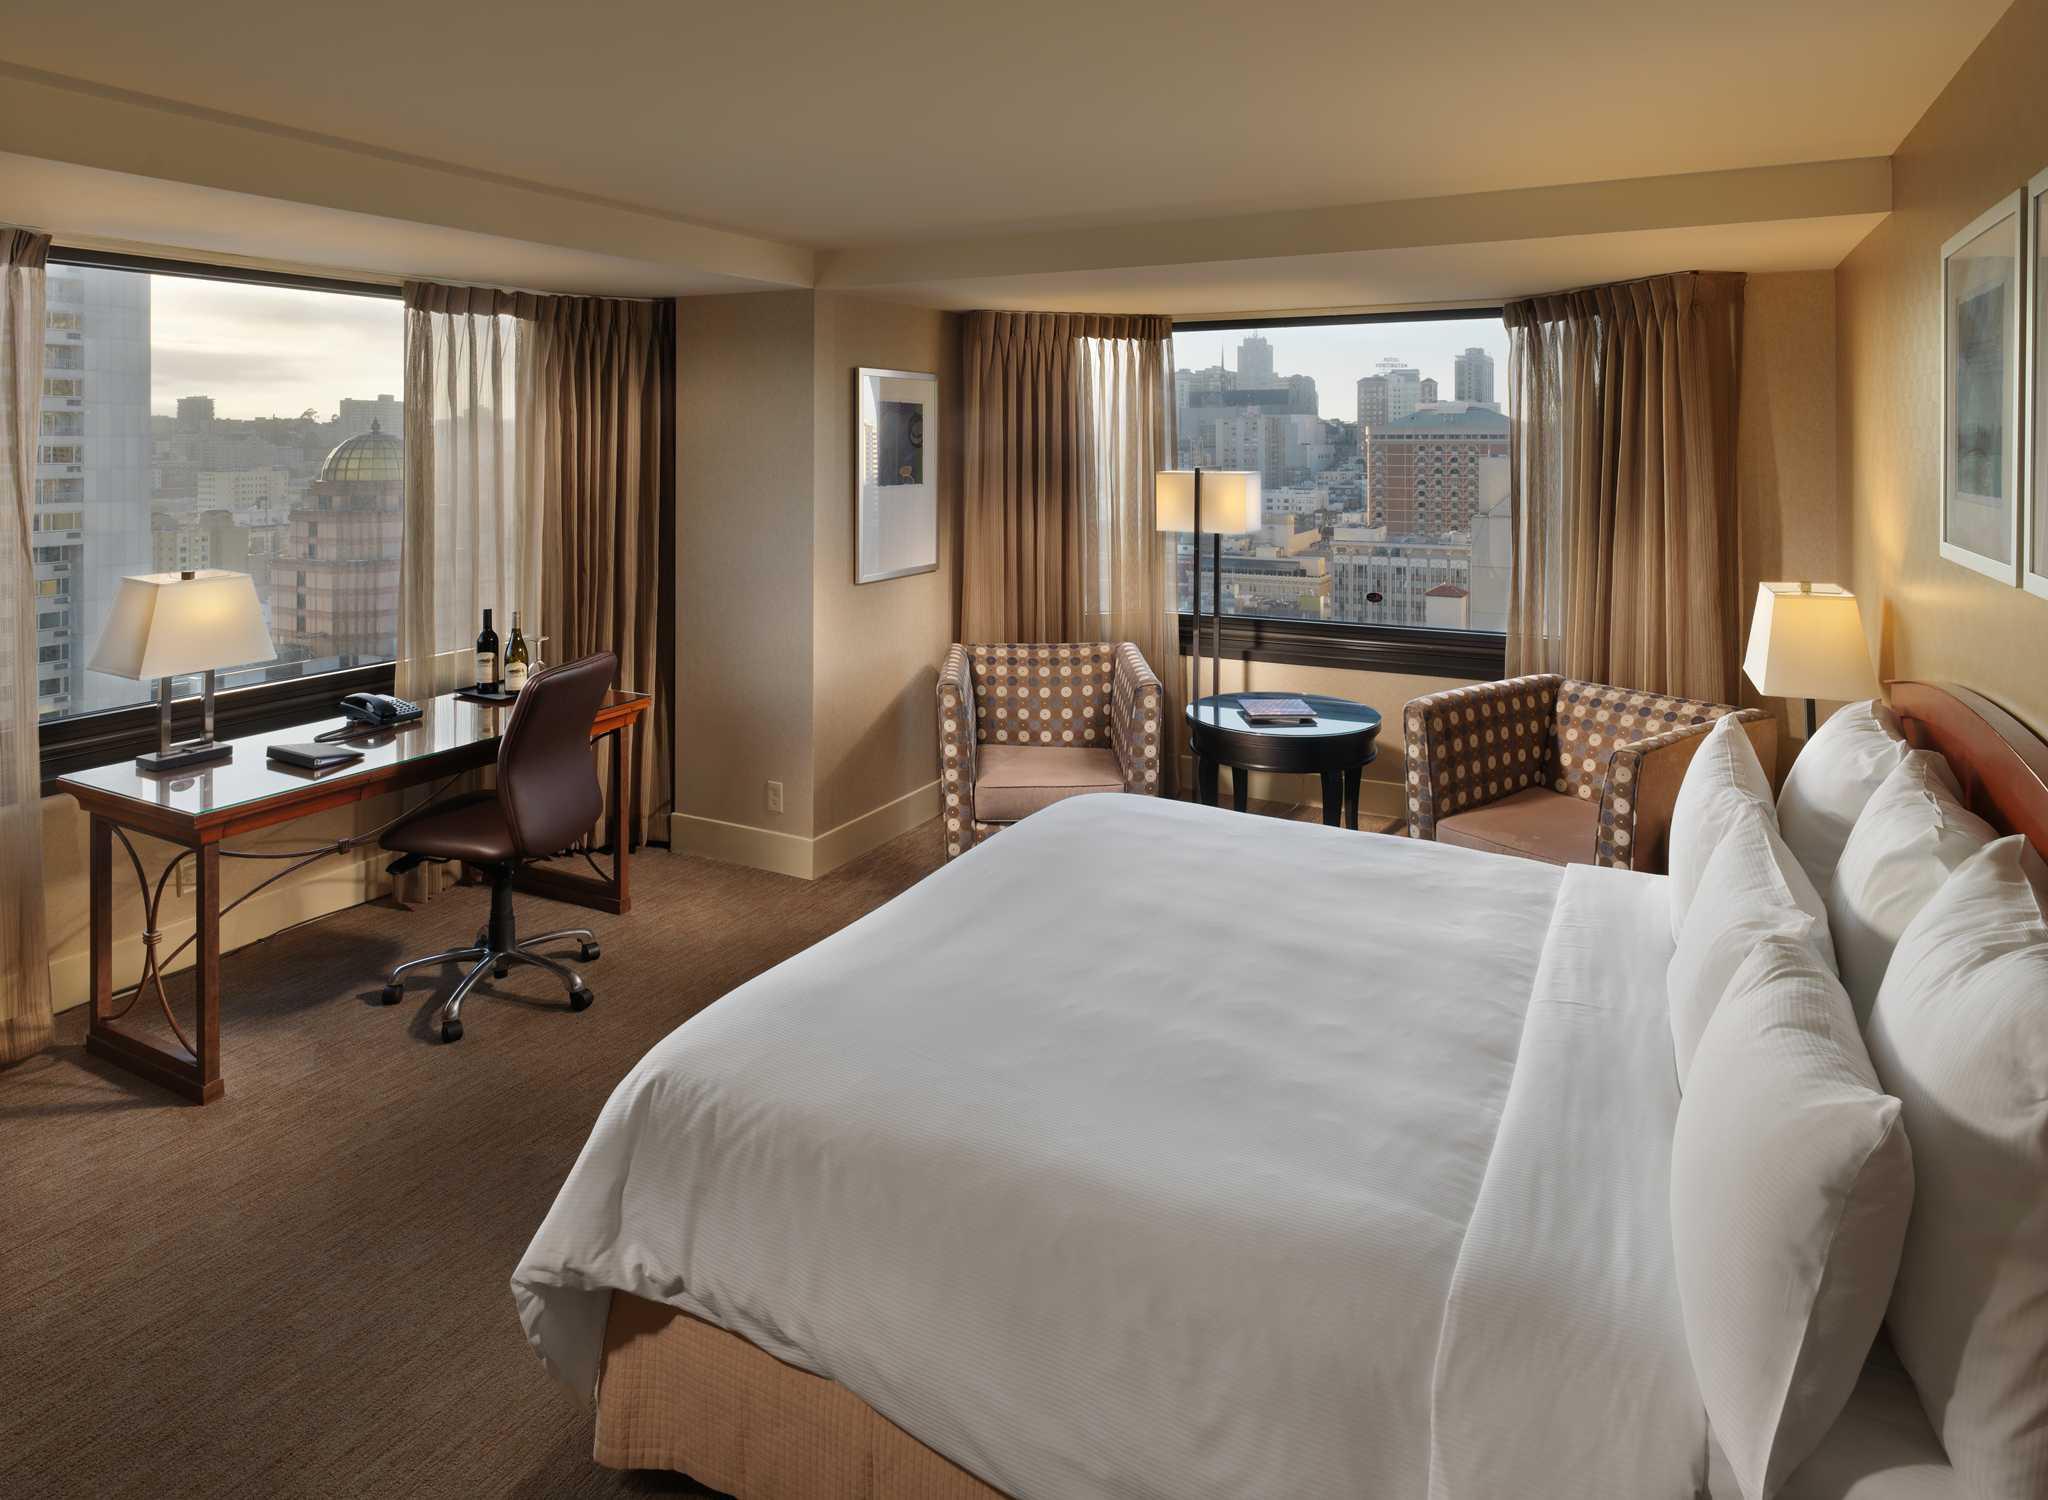 parc 55 san francisco union square hotel. Black Bedroom Furniture Sets. Home Design Ideas